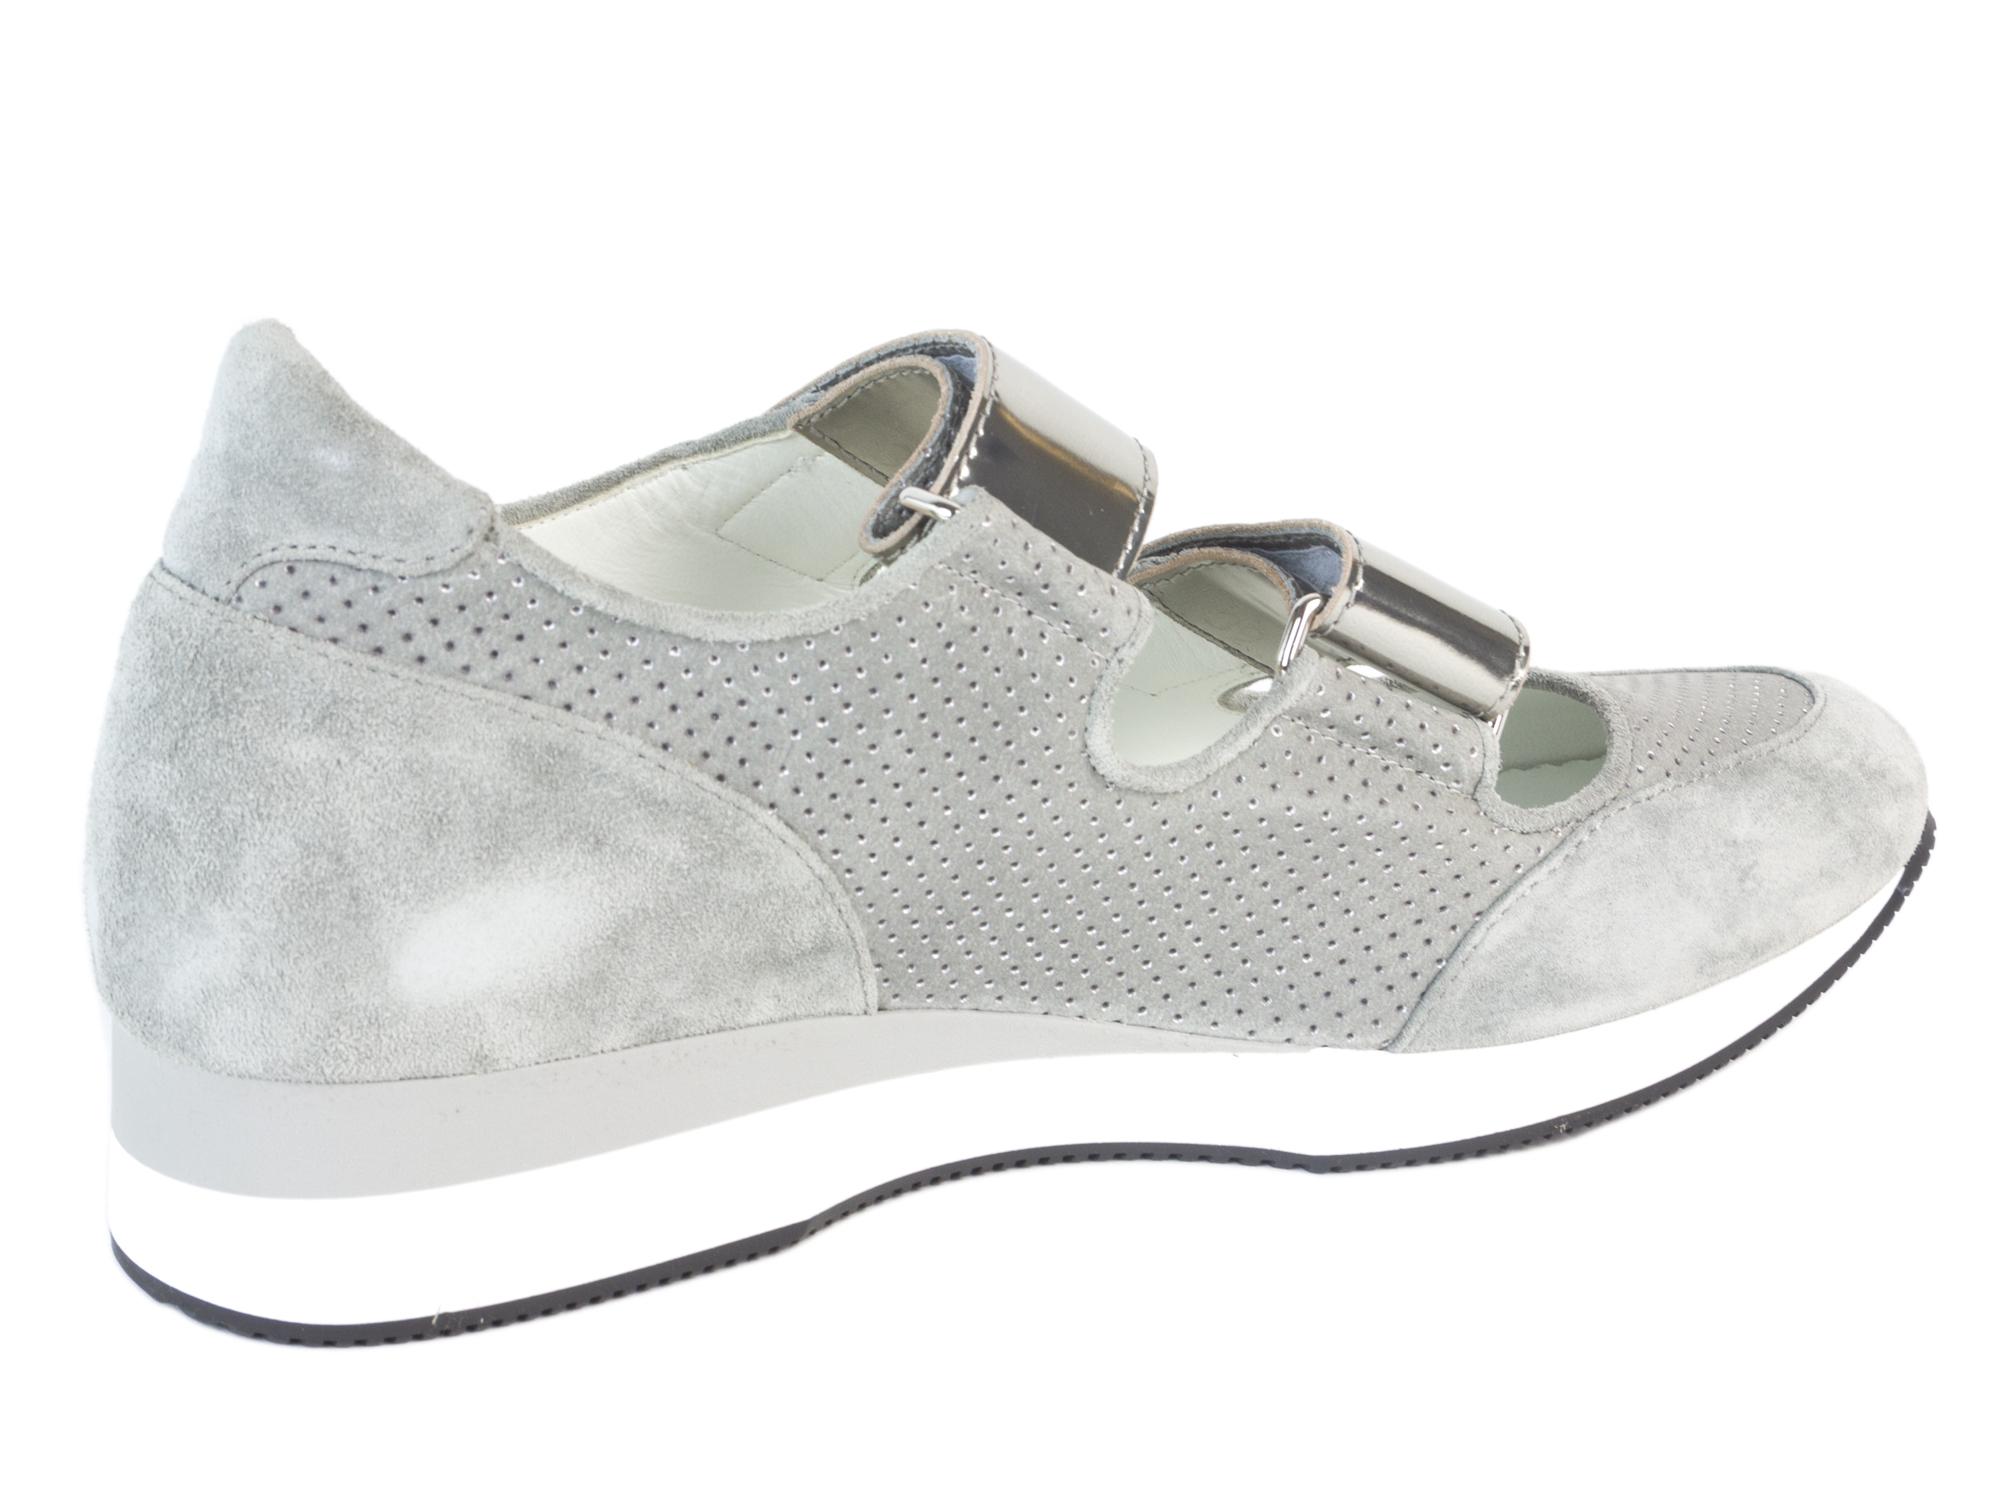 Max Mara Womens Mm34 Leather Velcro Sneakers 495 Nib  Ebay-7130